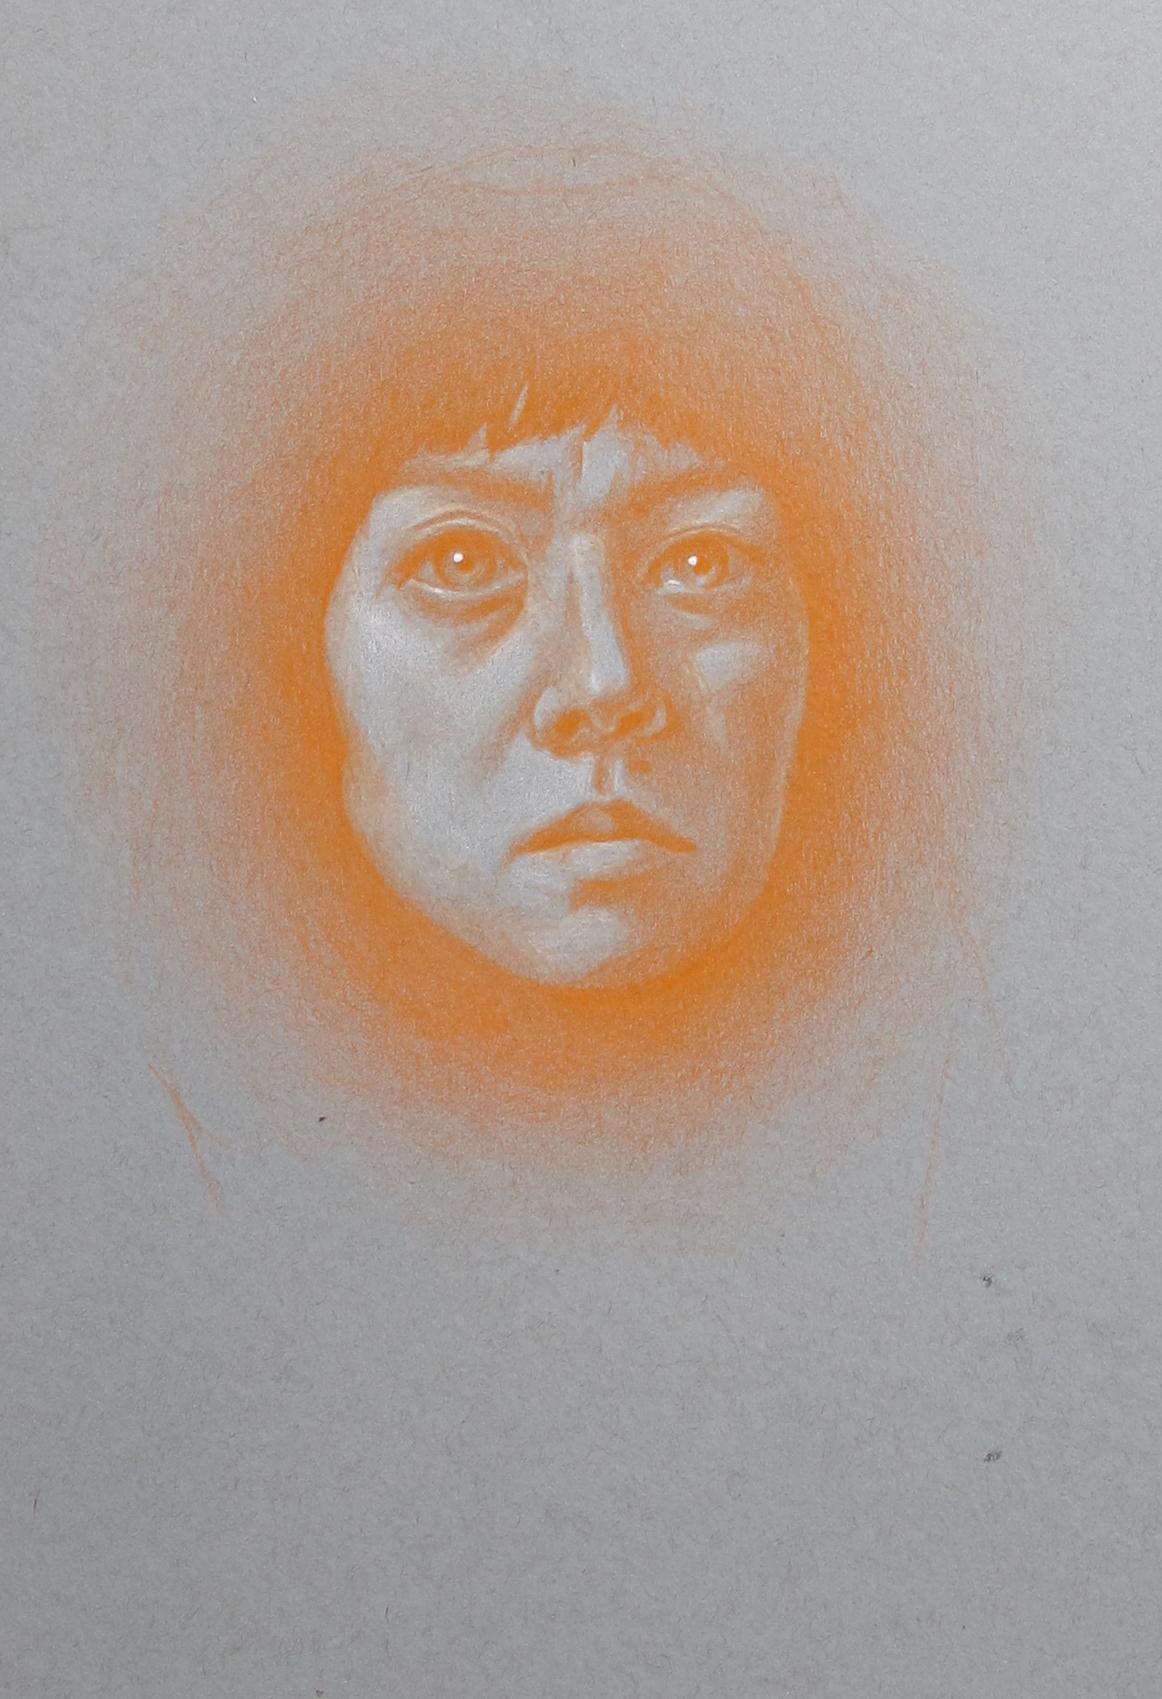 Quarantine Self-portrait (Tired in Orange)